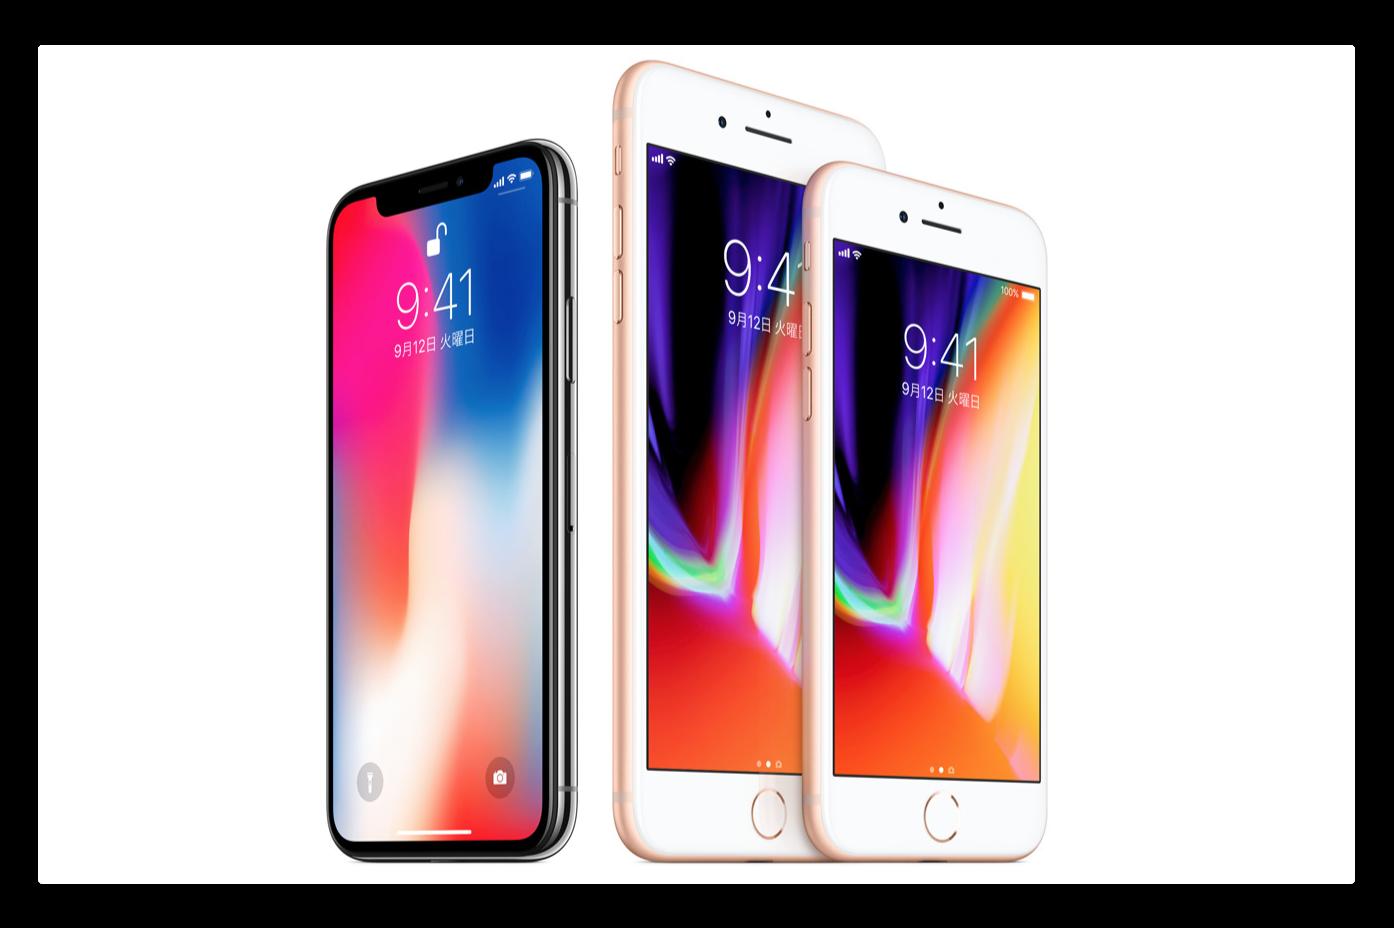 Tim Cook氏、iPhone Xの顧客満足度は98%と語る